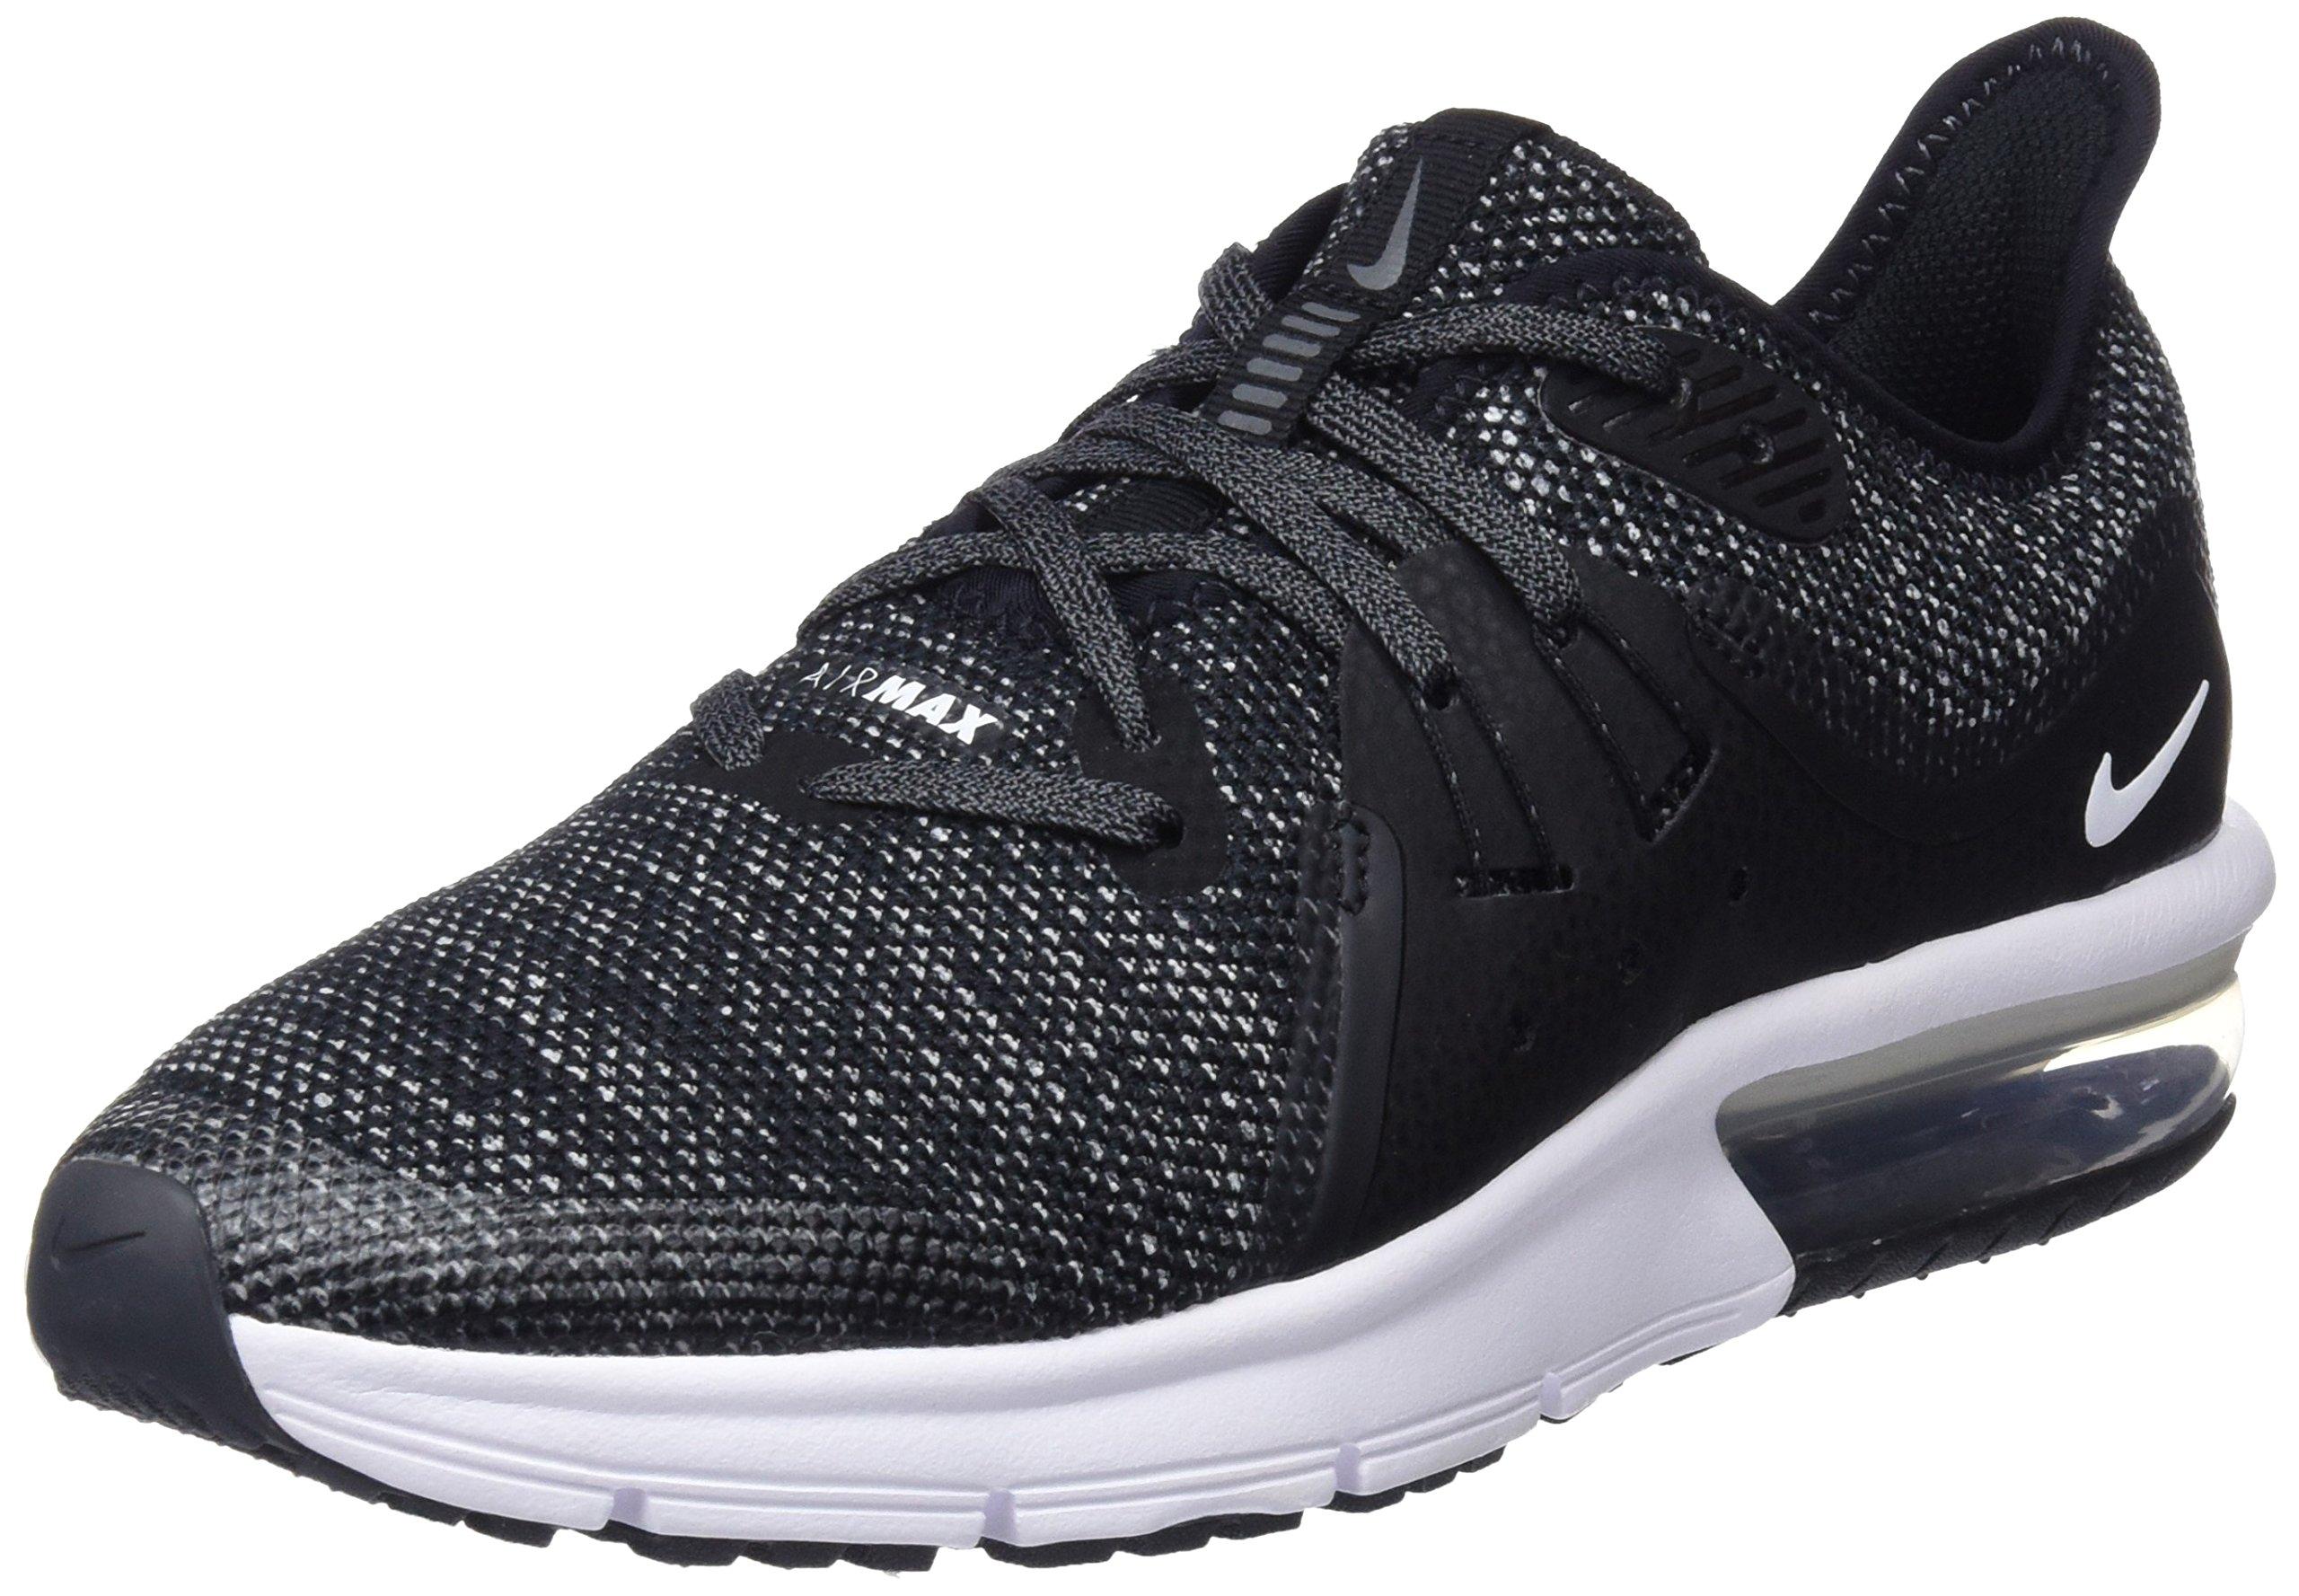 Nike 922884 001: Air Max Sequent 3 Black/White/Grey Big Kid Running